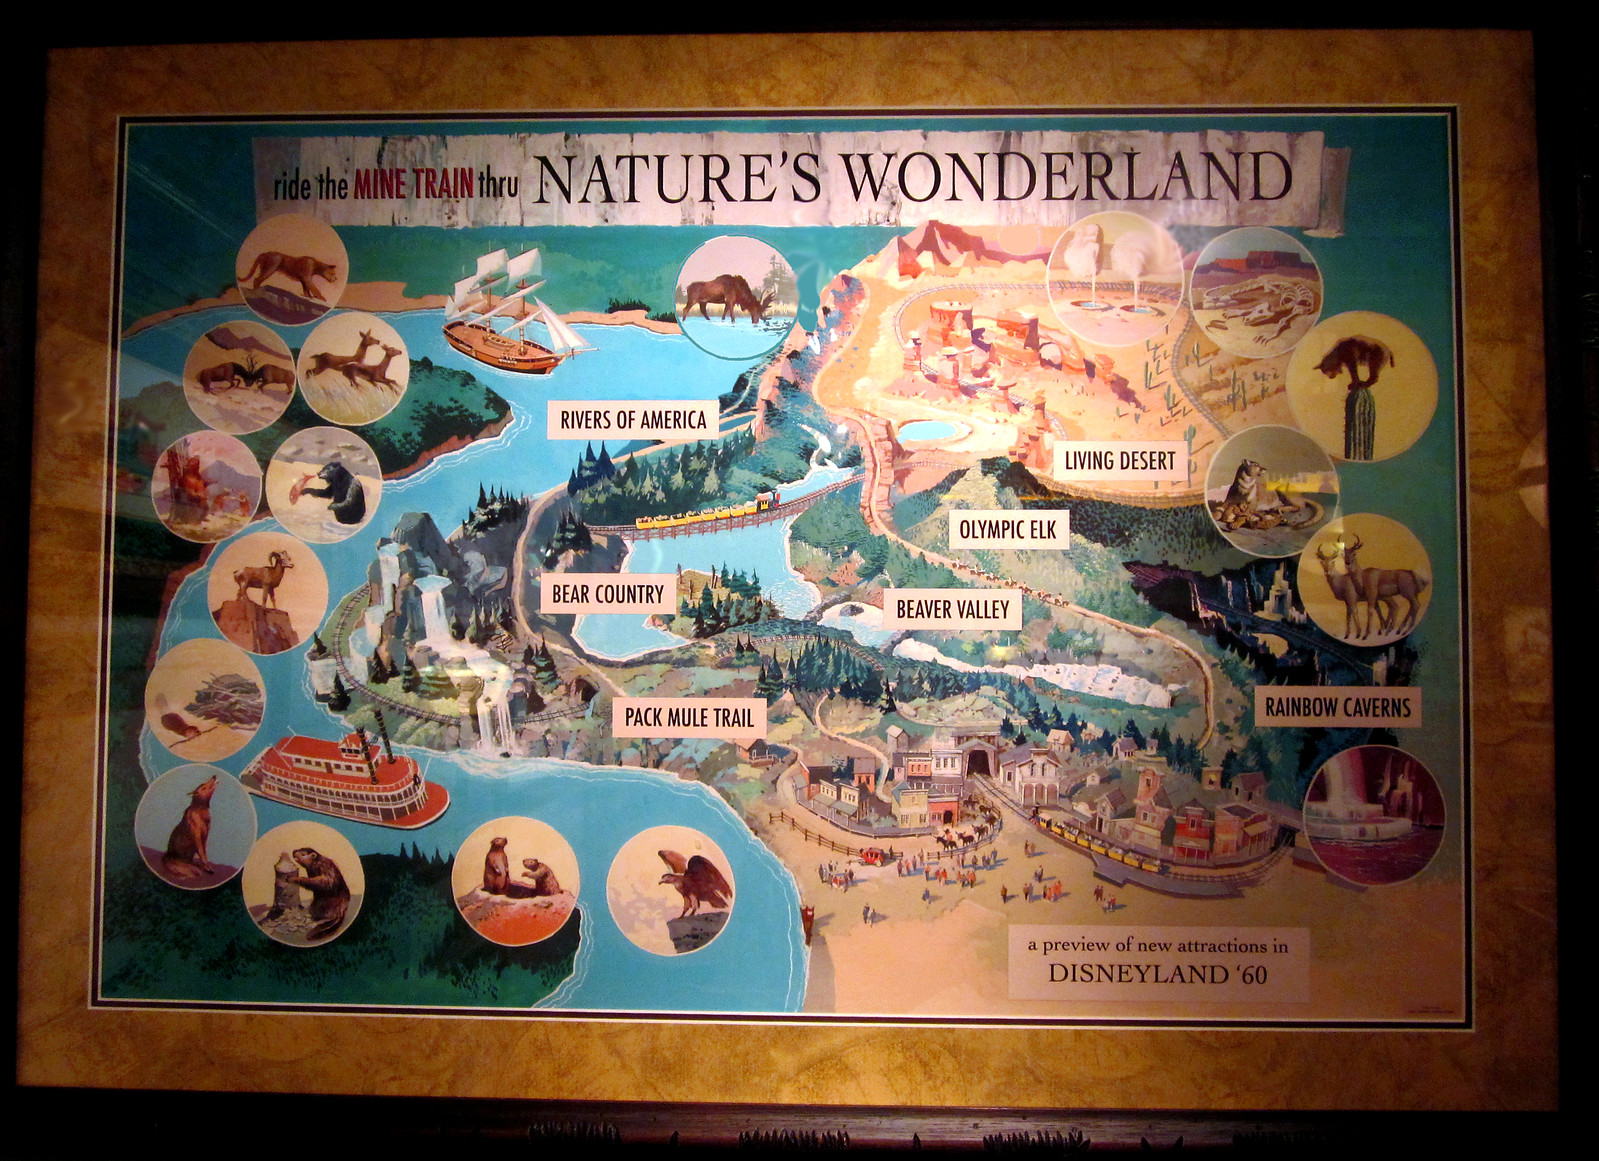 Nature's Wonderland - DISNEYLAND - Preview Poster - 1960